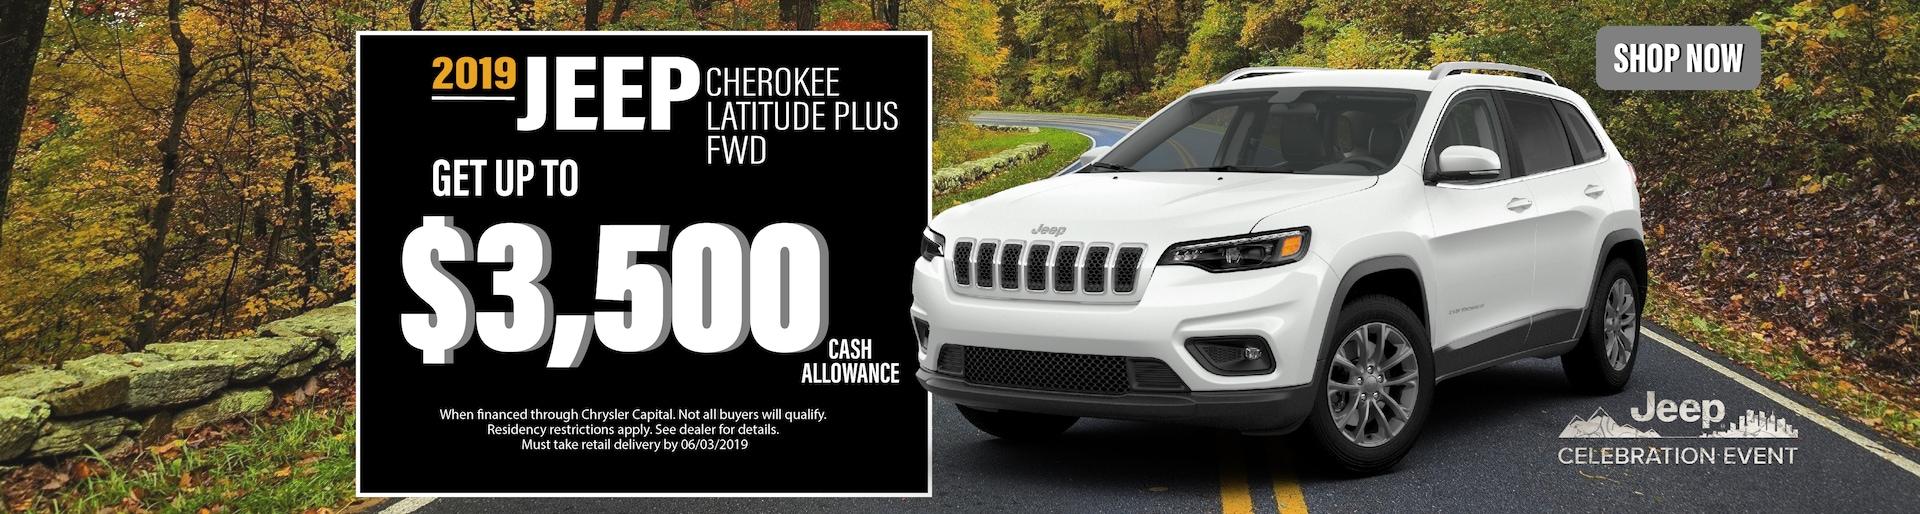 Car Dealerships In Longview Tx >> Jeep Dealership Longview Texas Foto Jeep And Wallpaper Hd